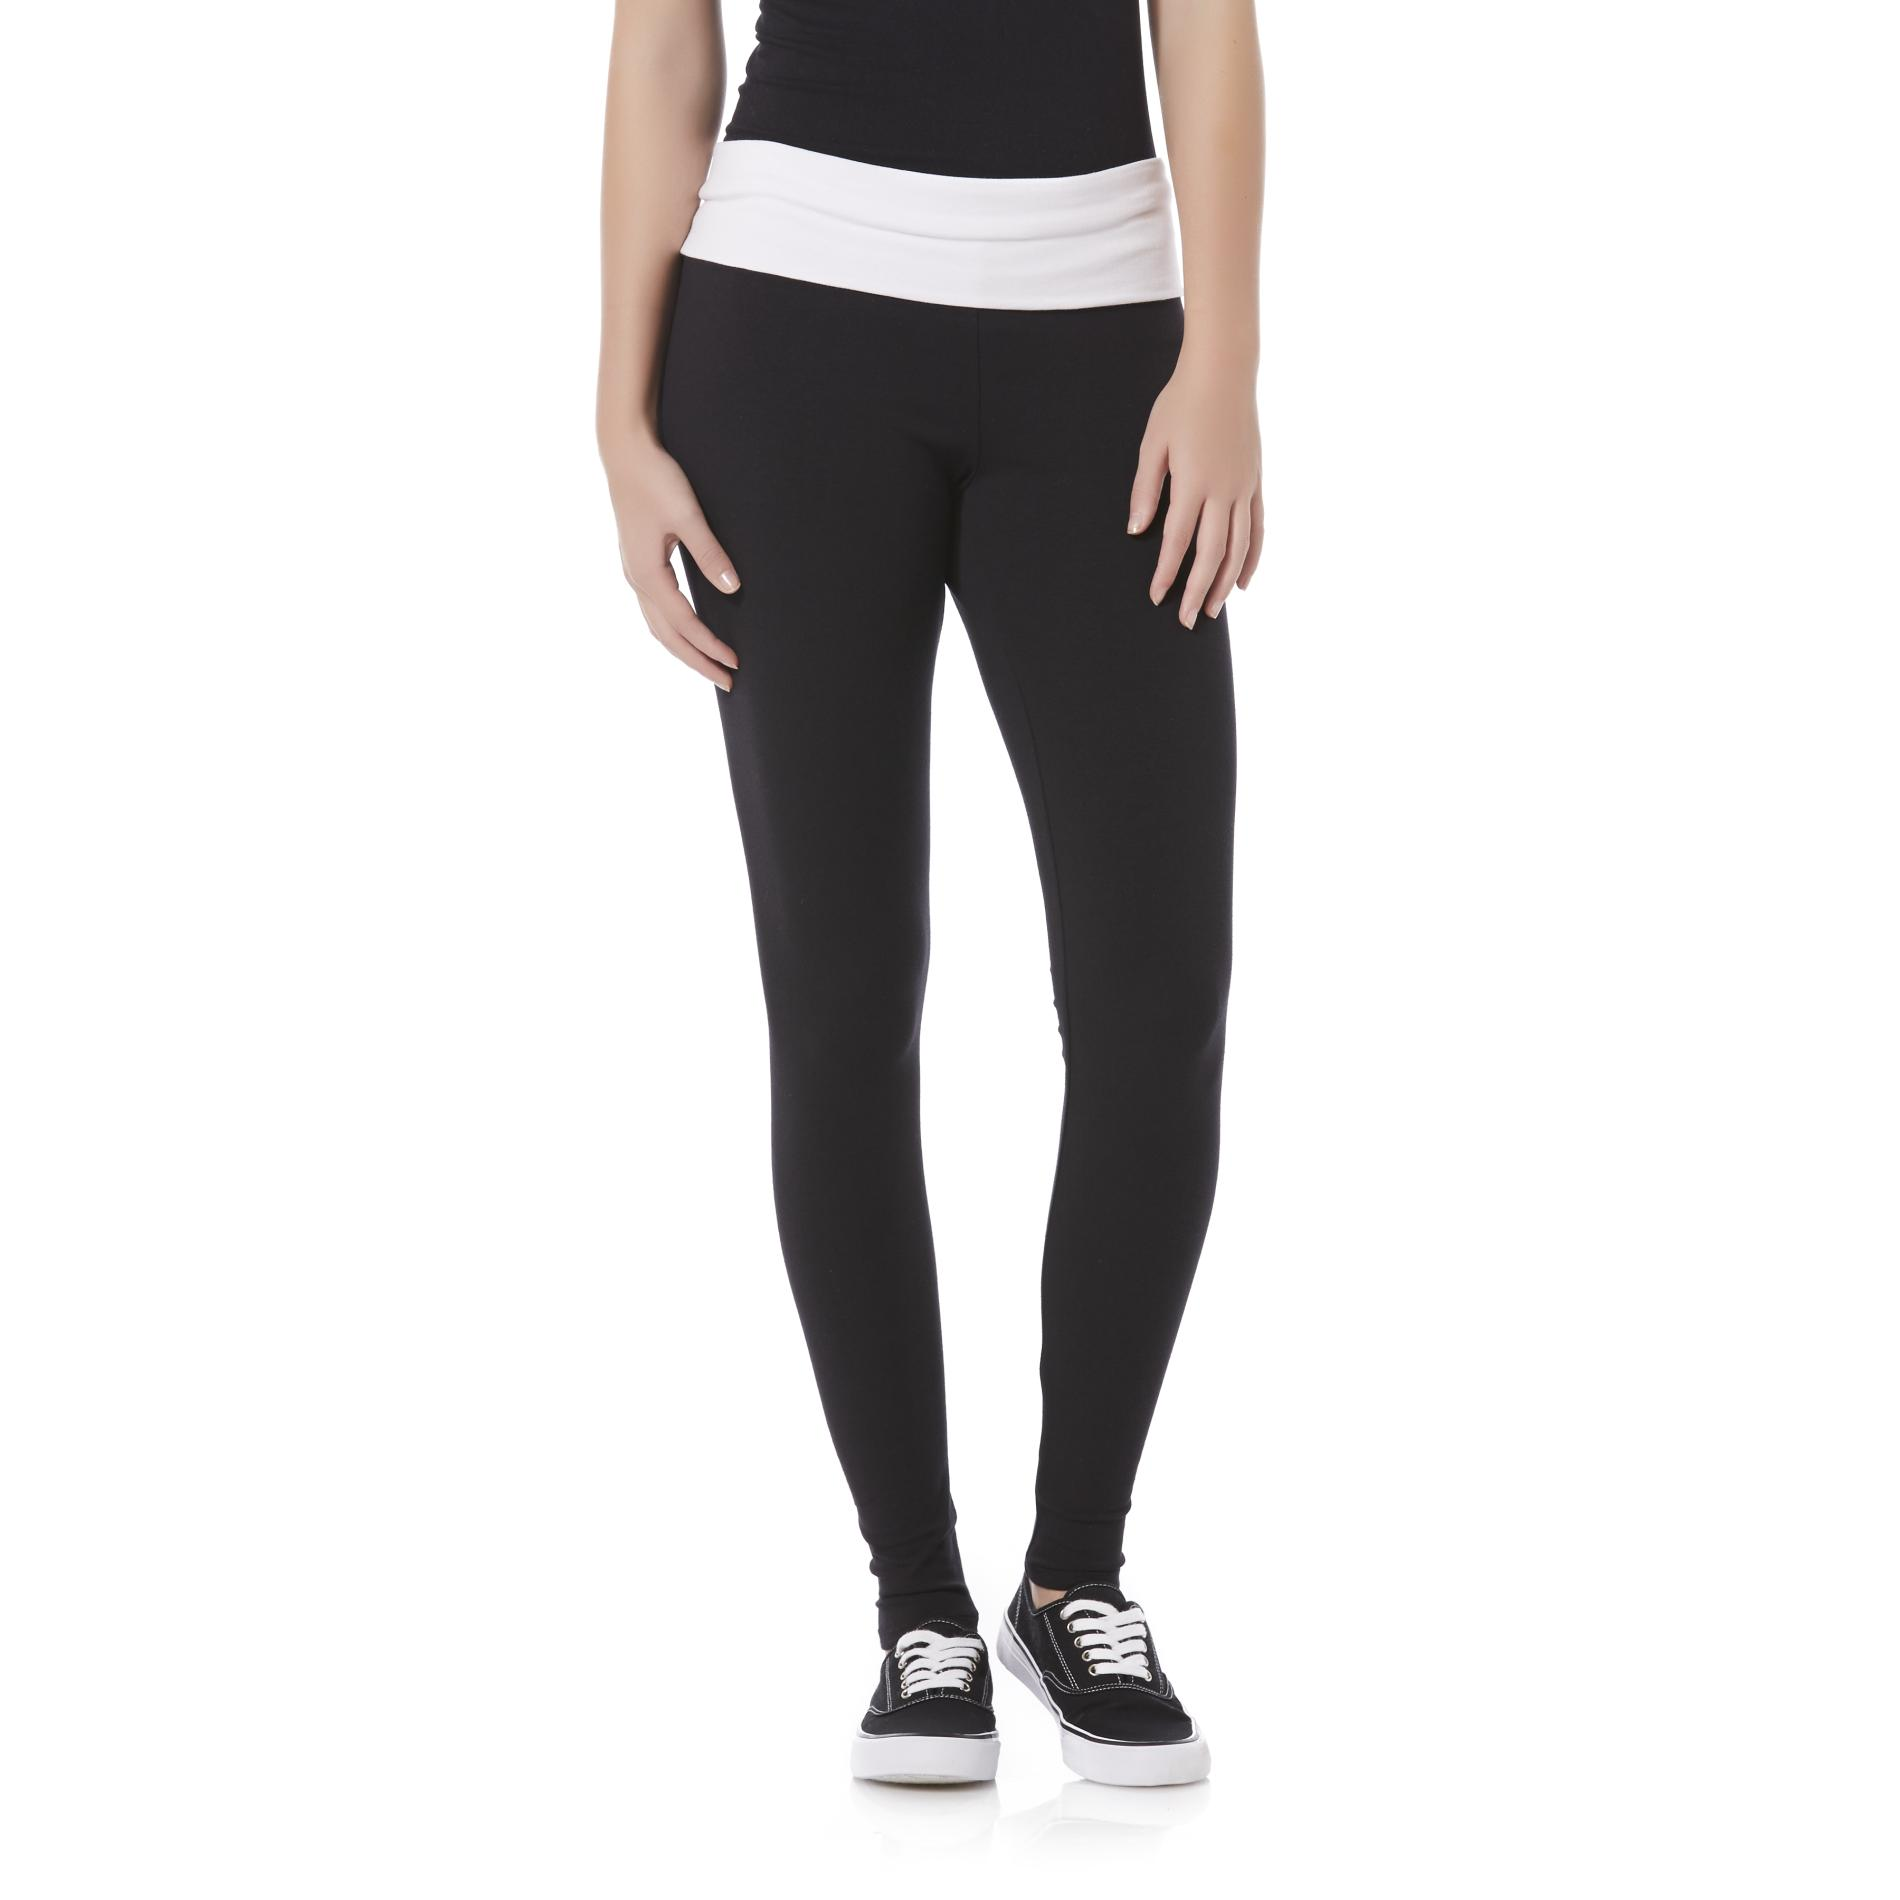 Bongo Junior's Fold-Over Yoga Pants - Ready PartNumber: 002VA84983512P MfgPartNumber: PP11622